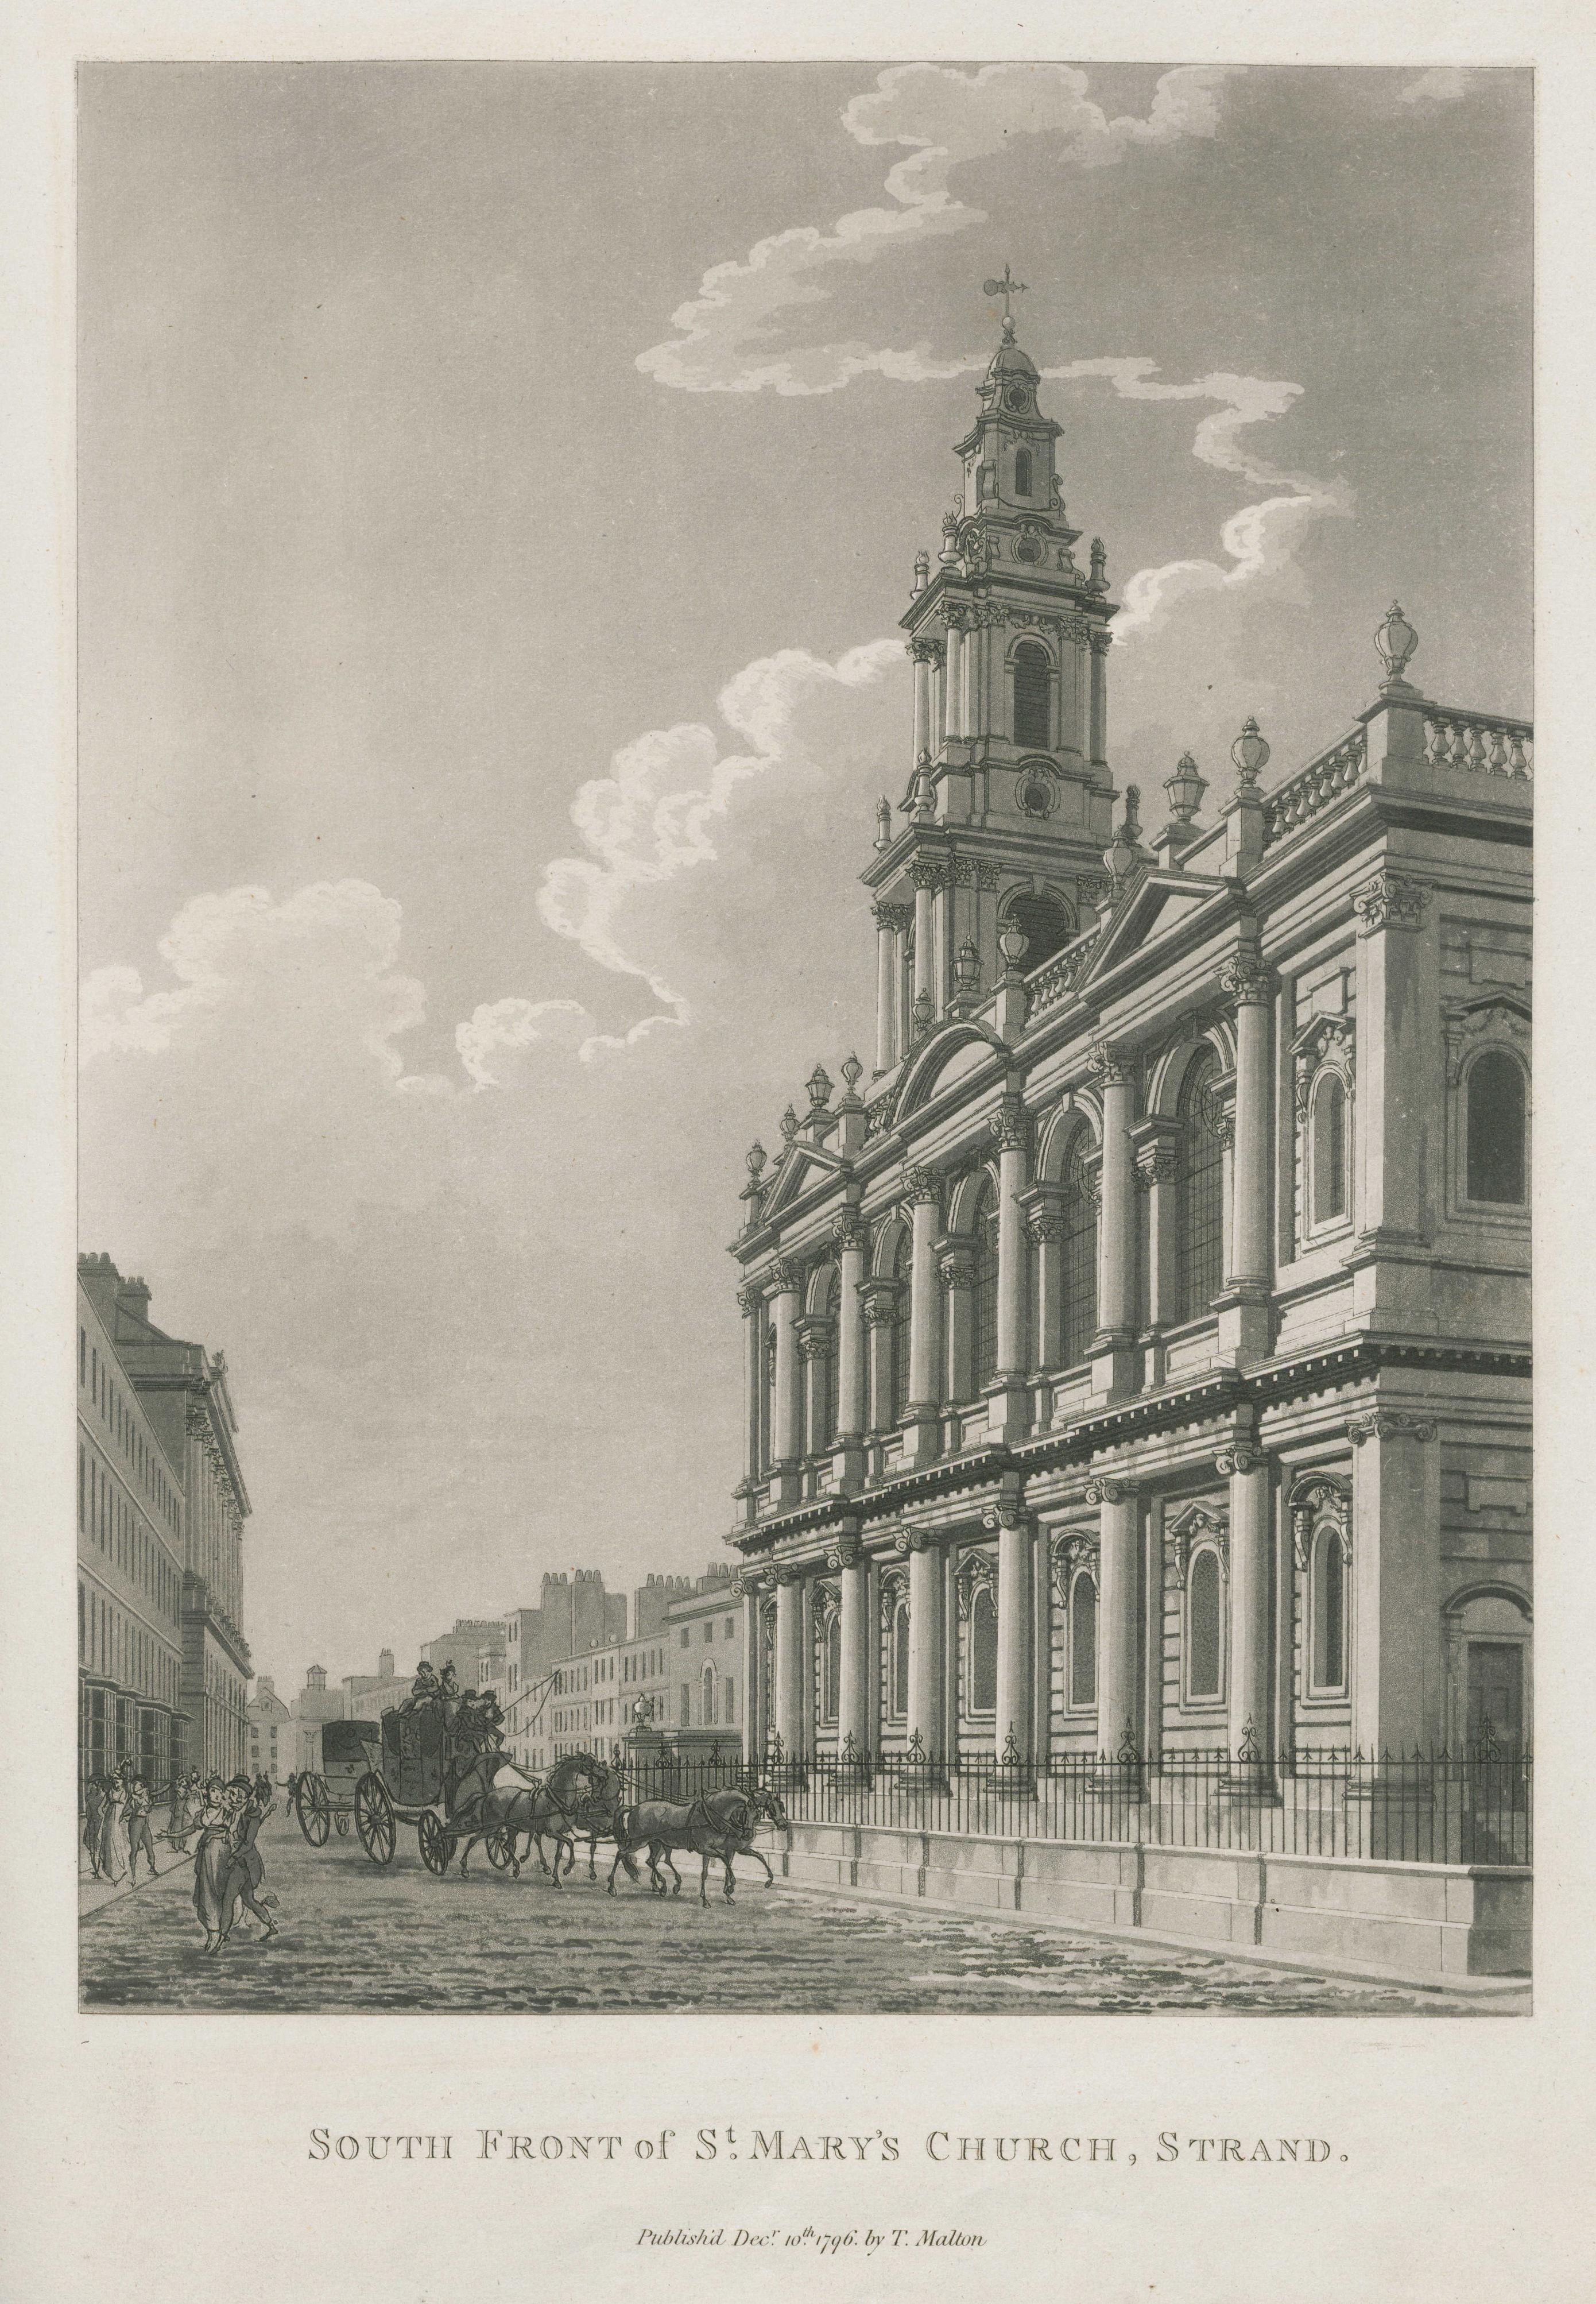 043 - Malton - South Front of St Mary's Church, Strand